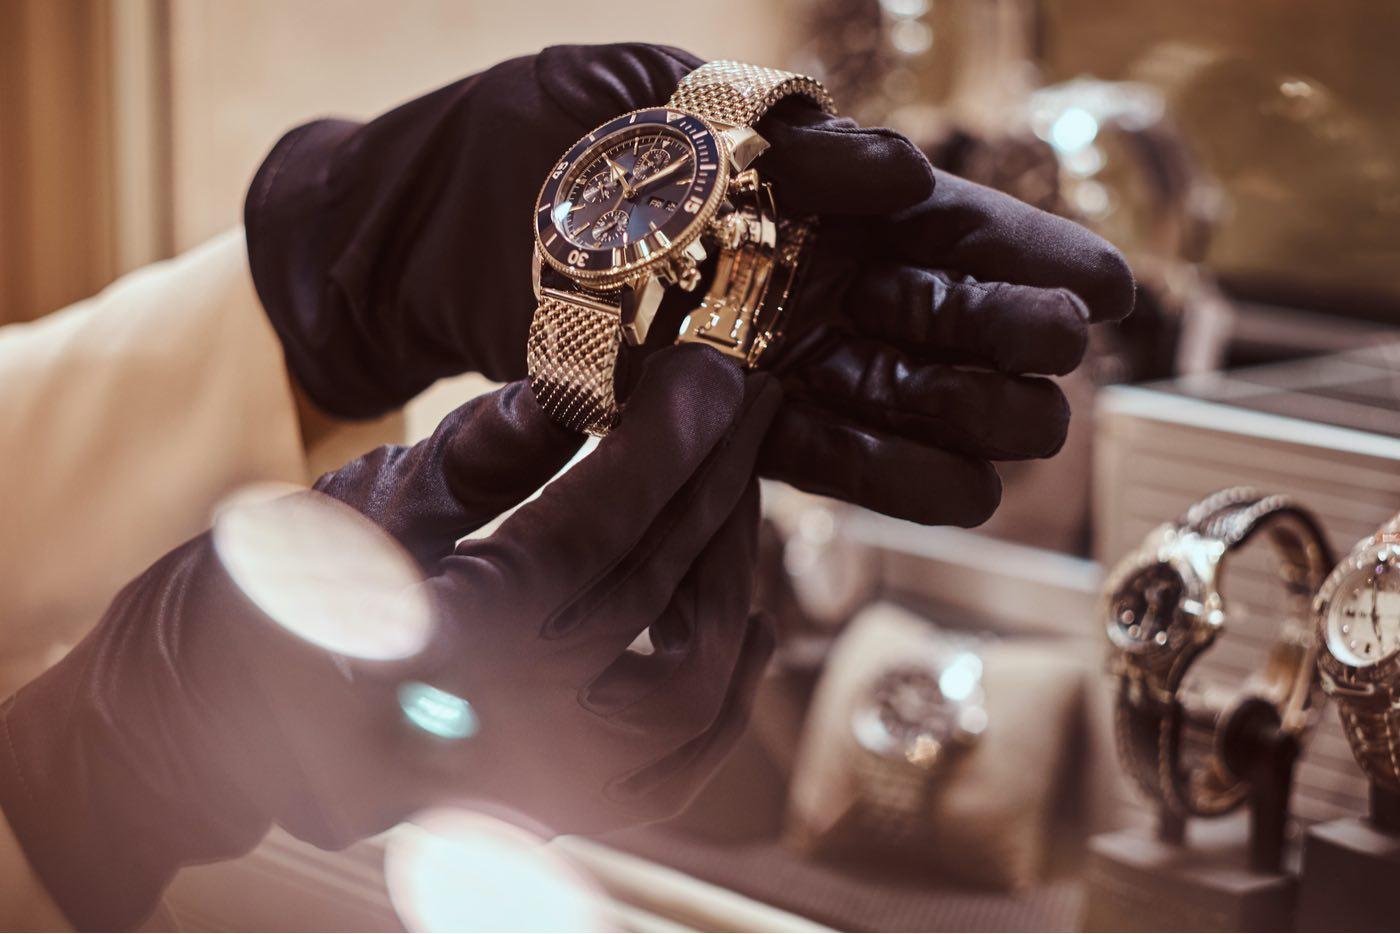 Relojes de lujo de segunda mano